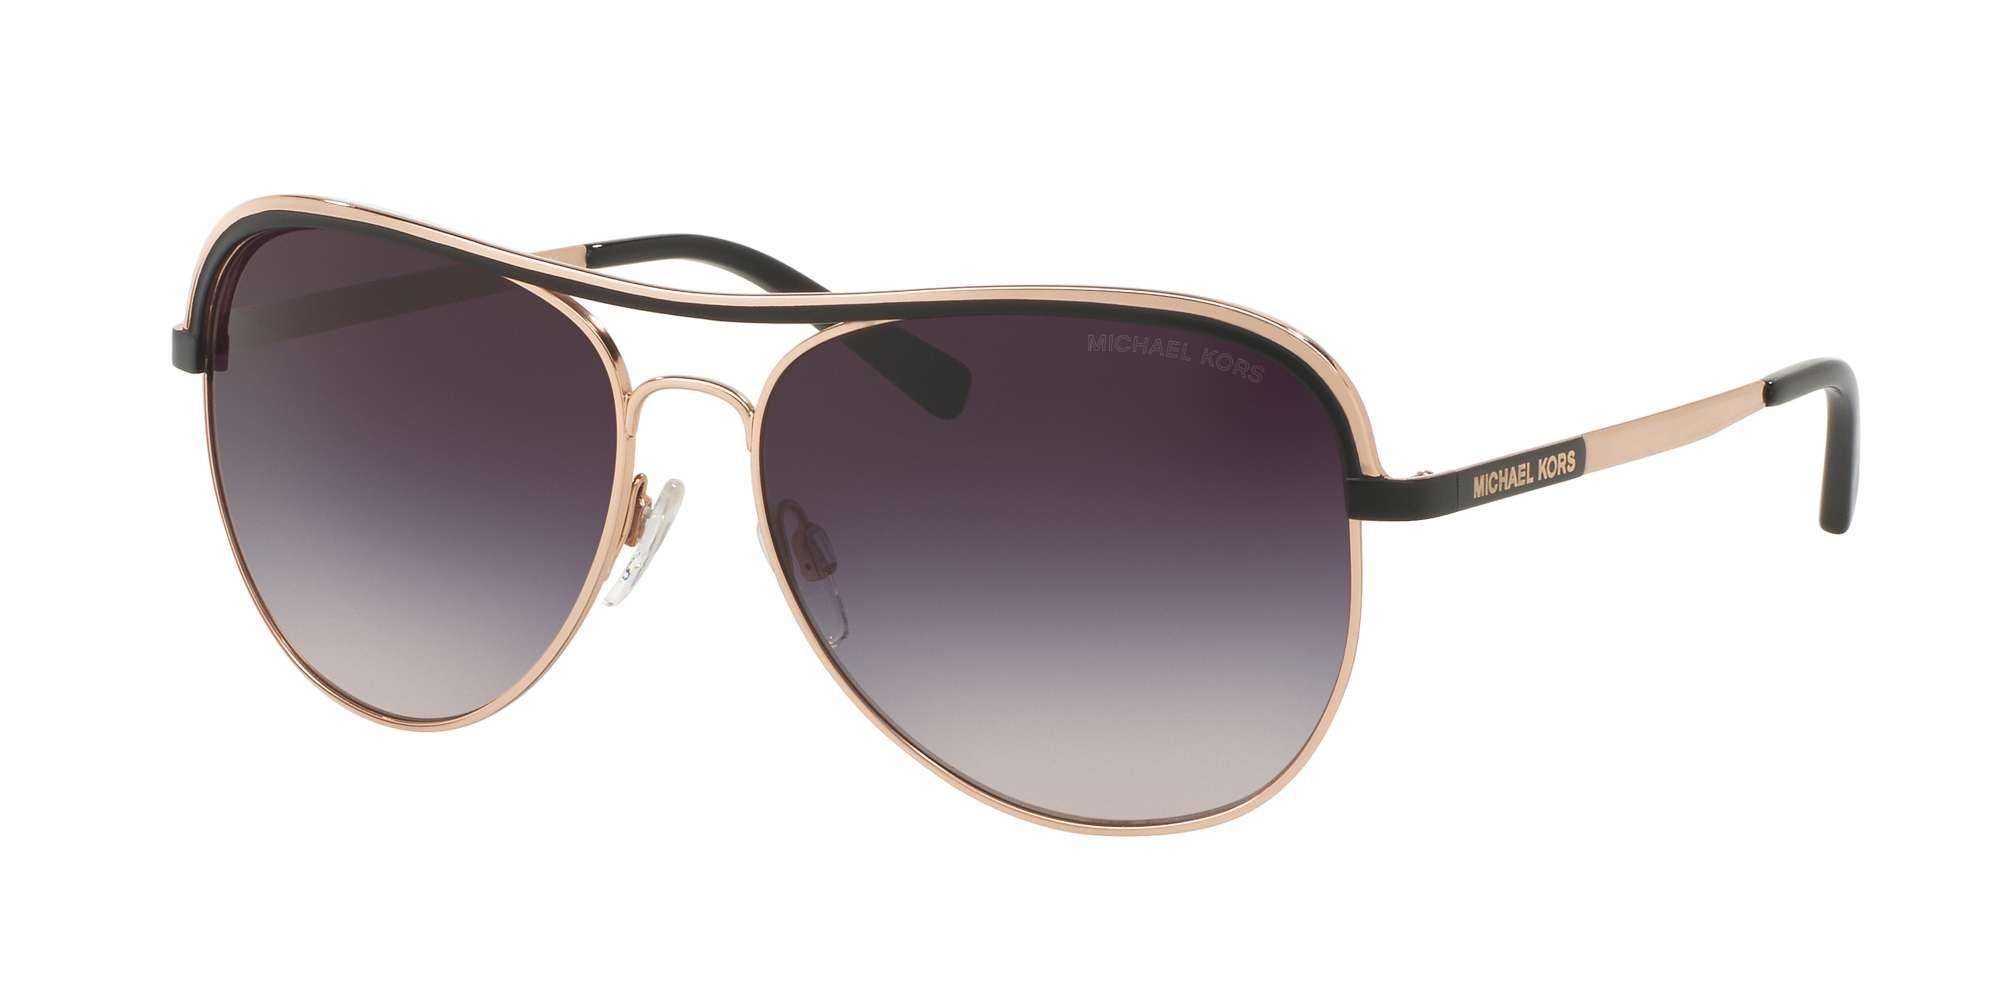 ROSE GOLD/BLACK / GREY ROSE GRADIENT lenses